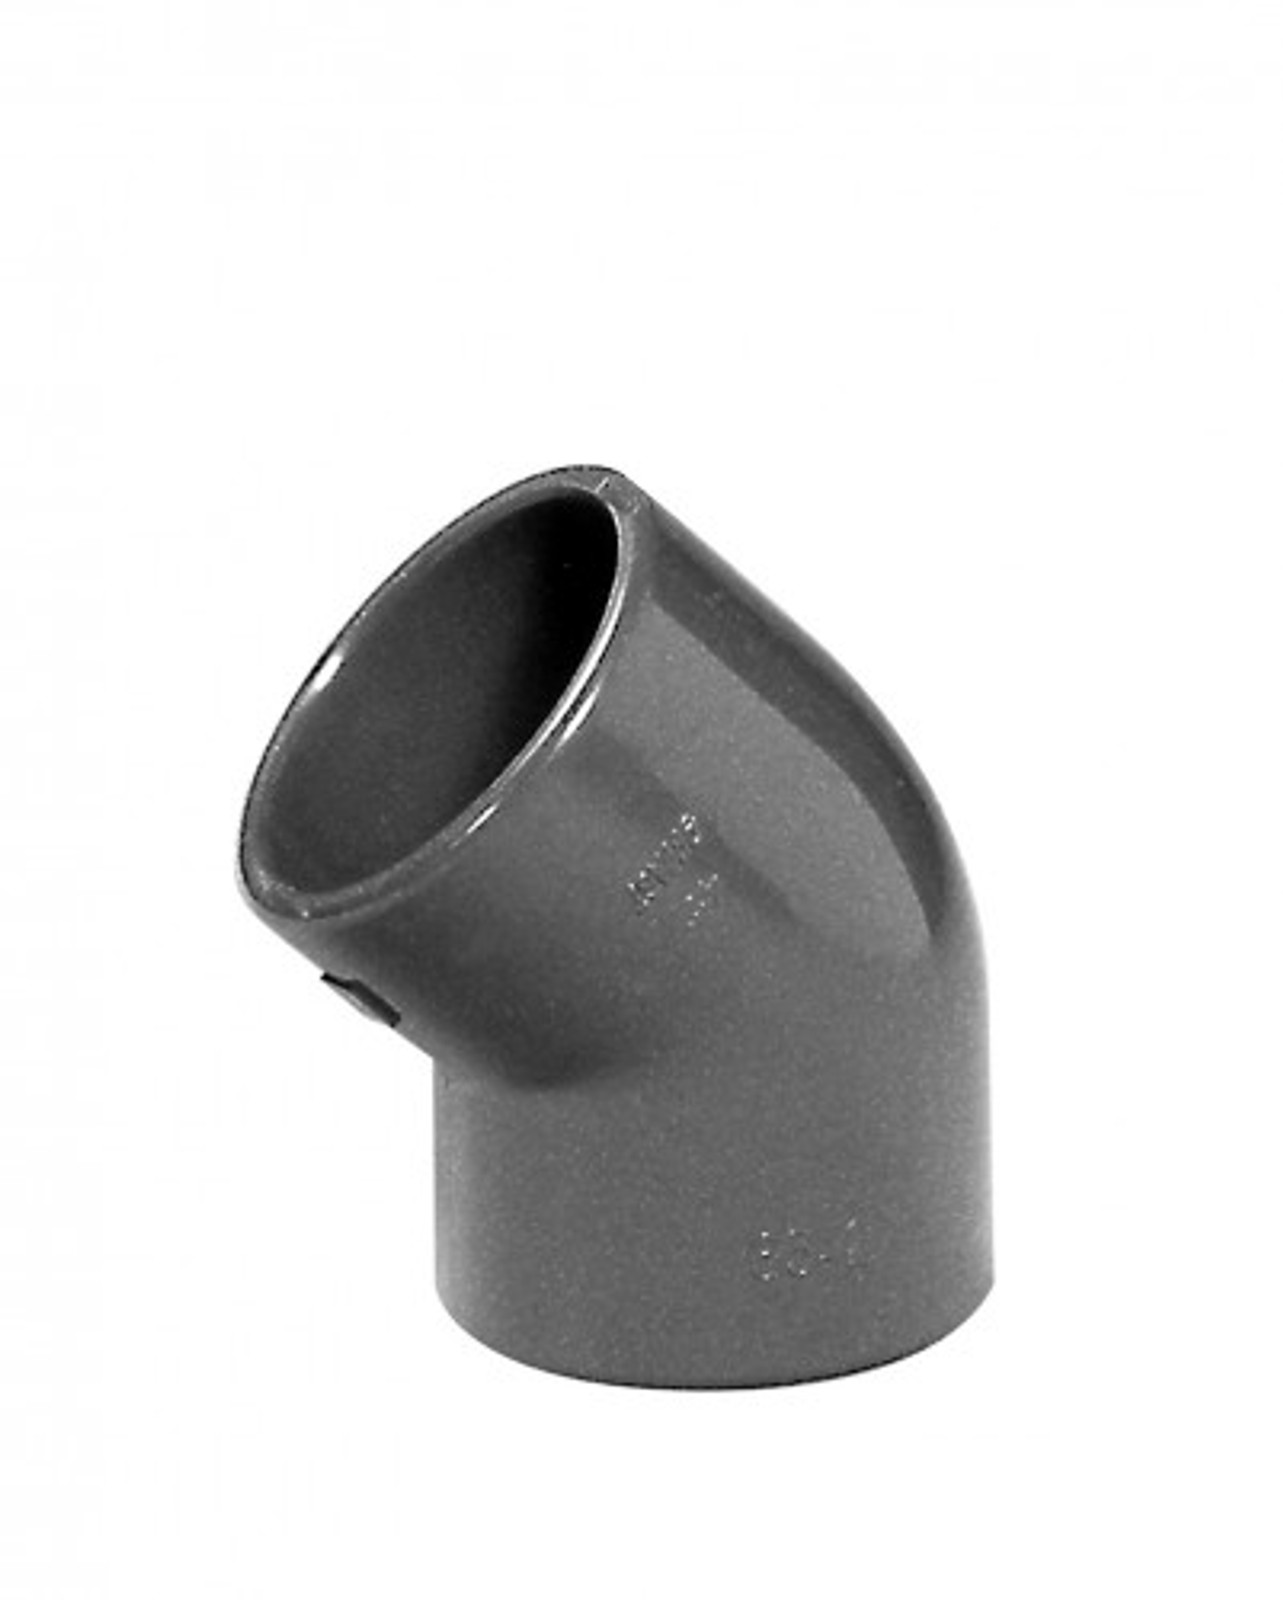 Winkel 45°, 12 mm aus PVC